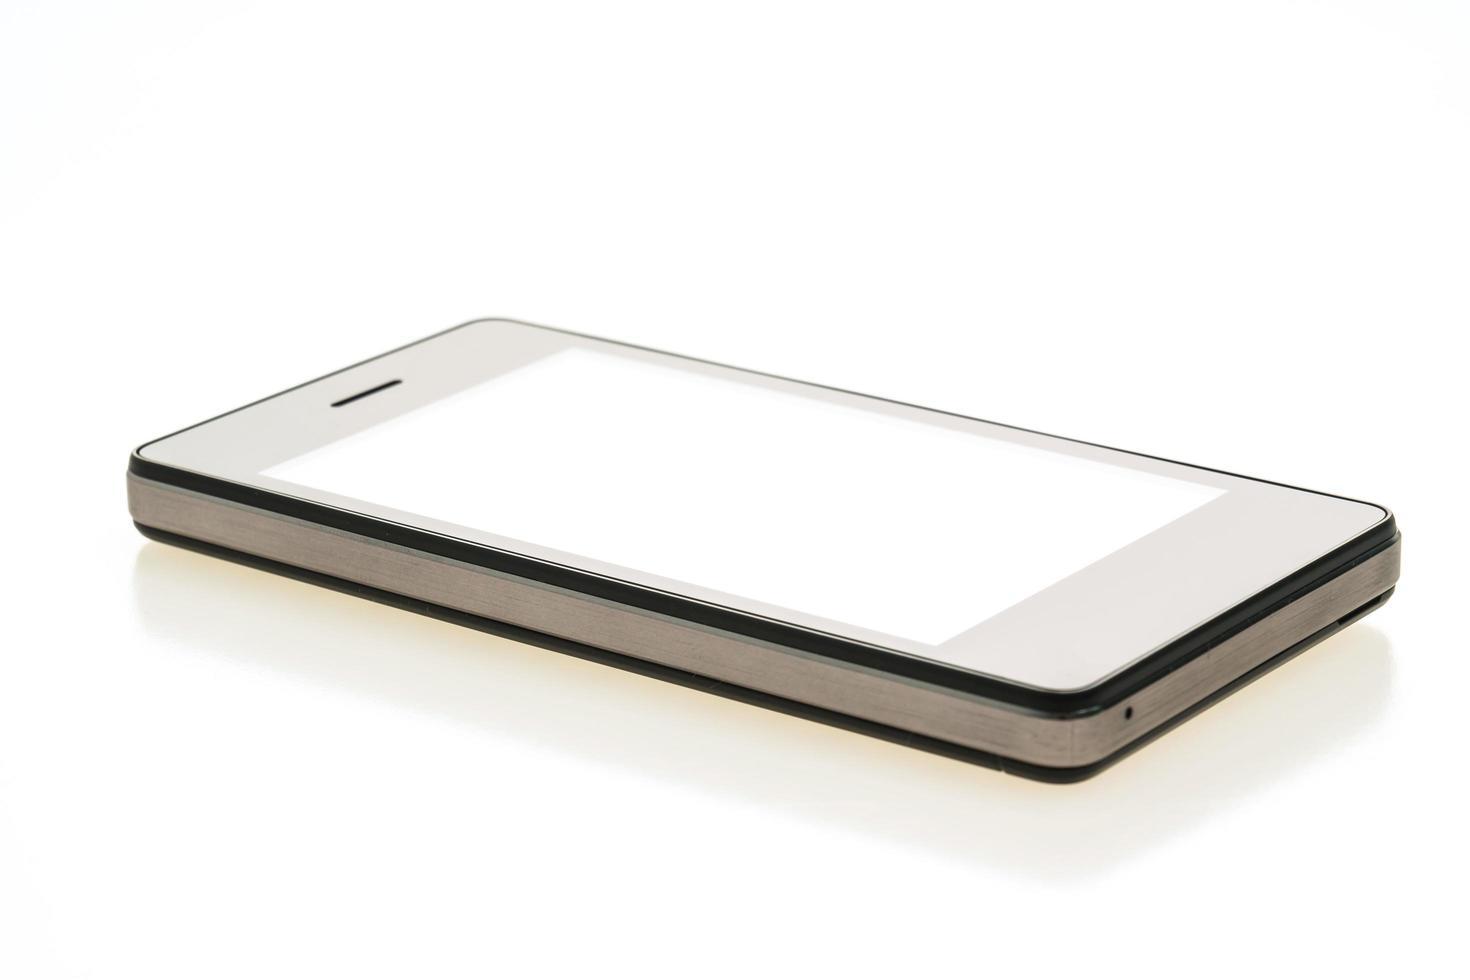 smartphone sobre fondo blanco foto